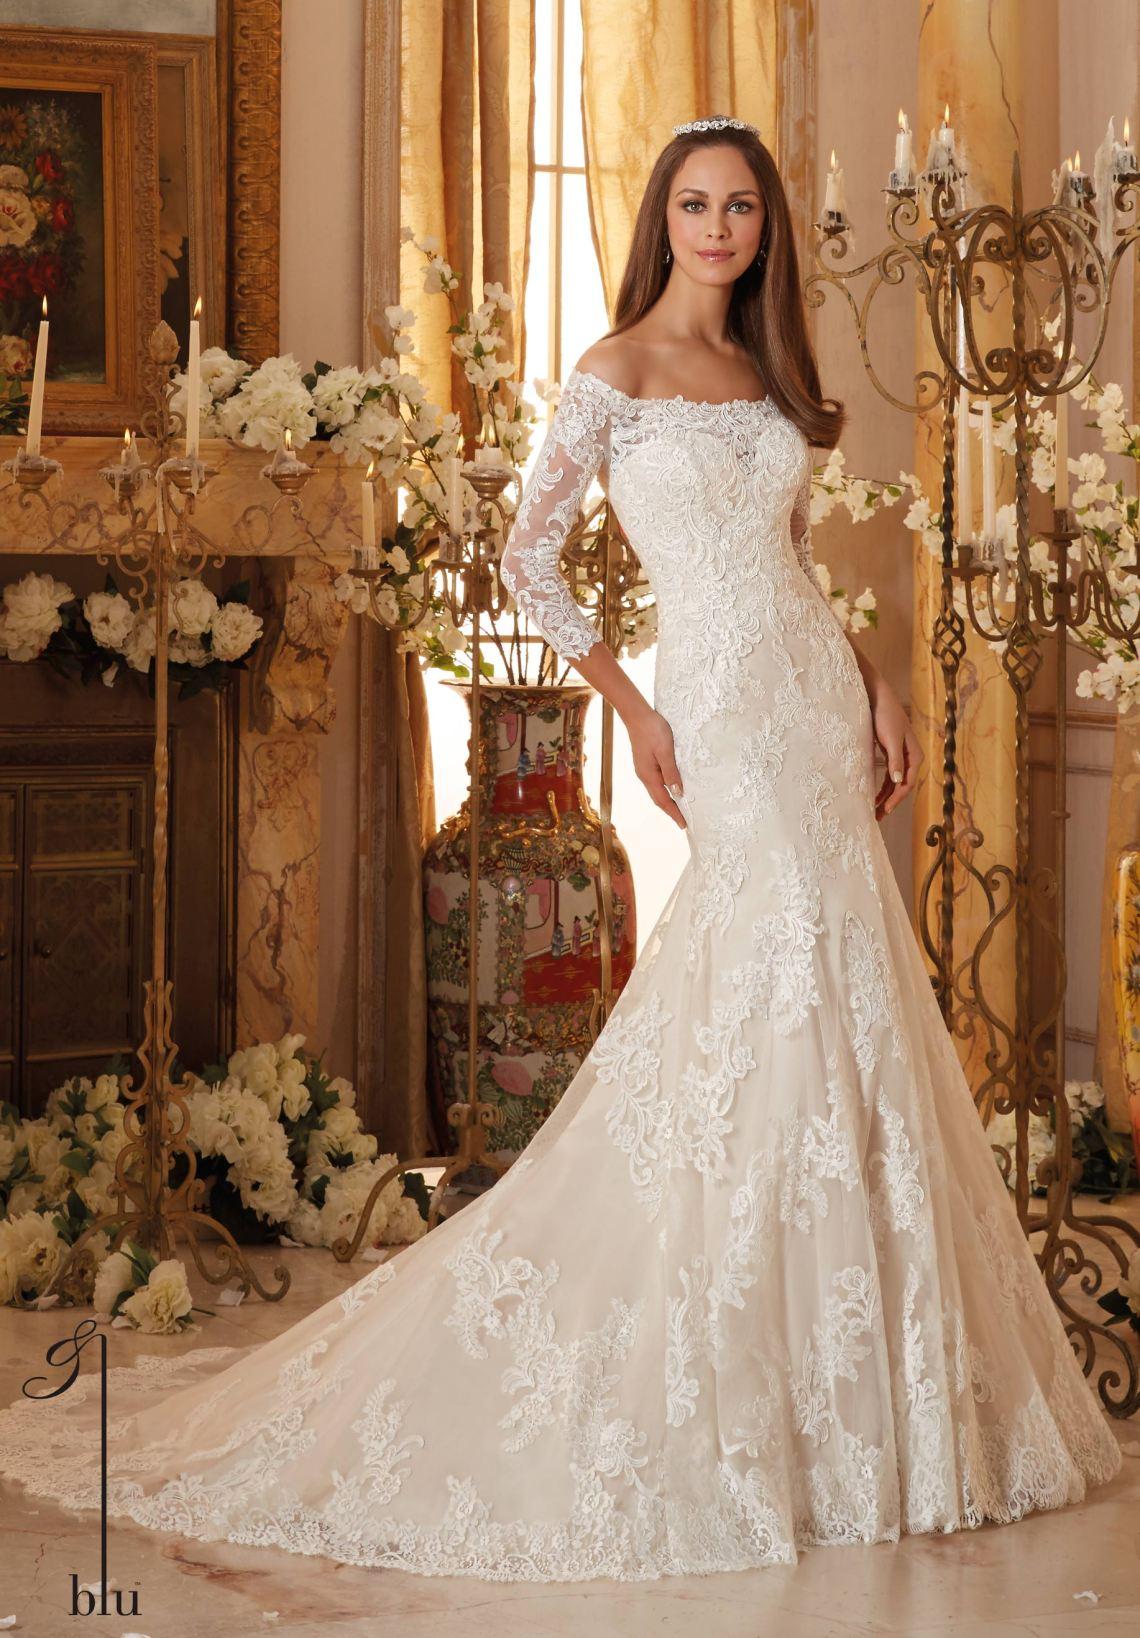 10 Popular Wedding Dress Styles for Getting Married in Vegas